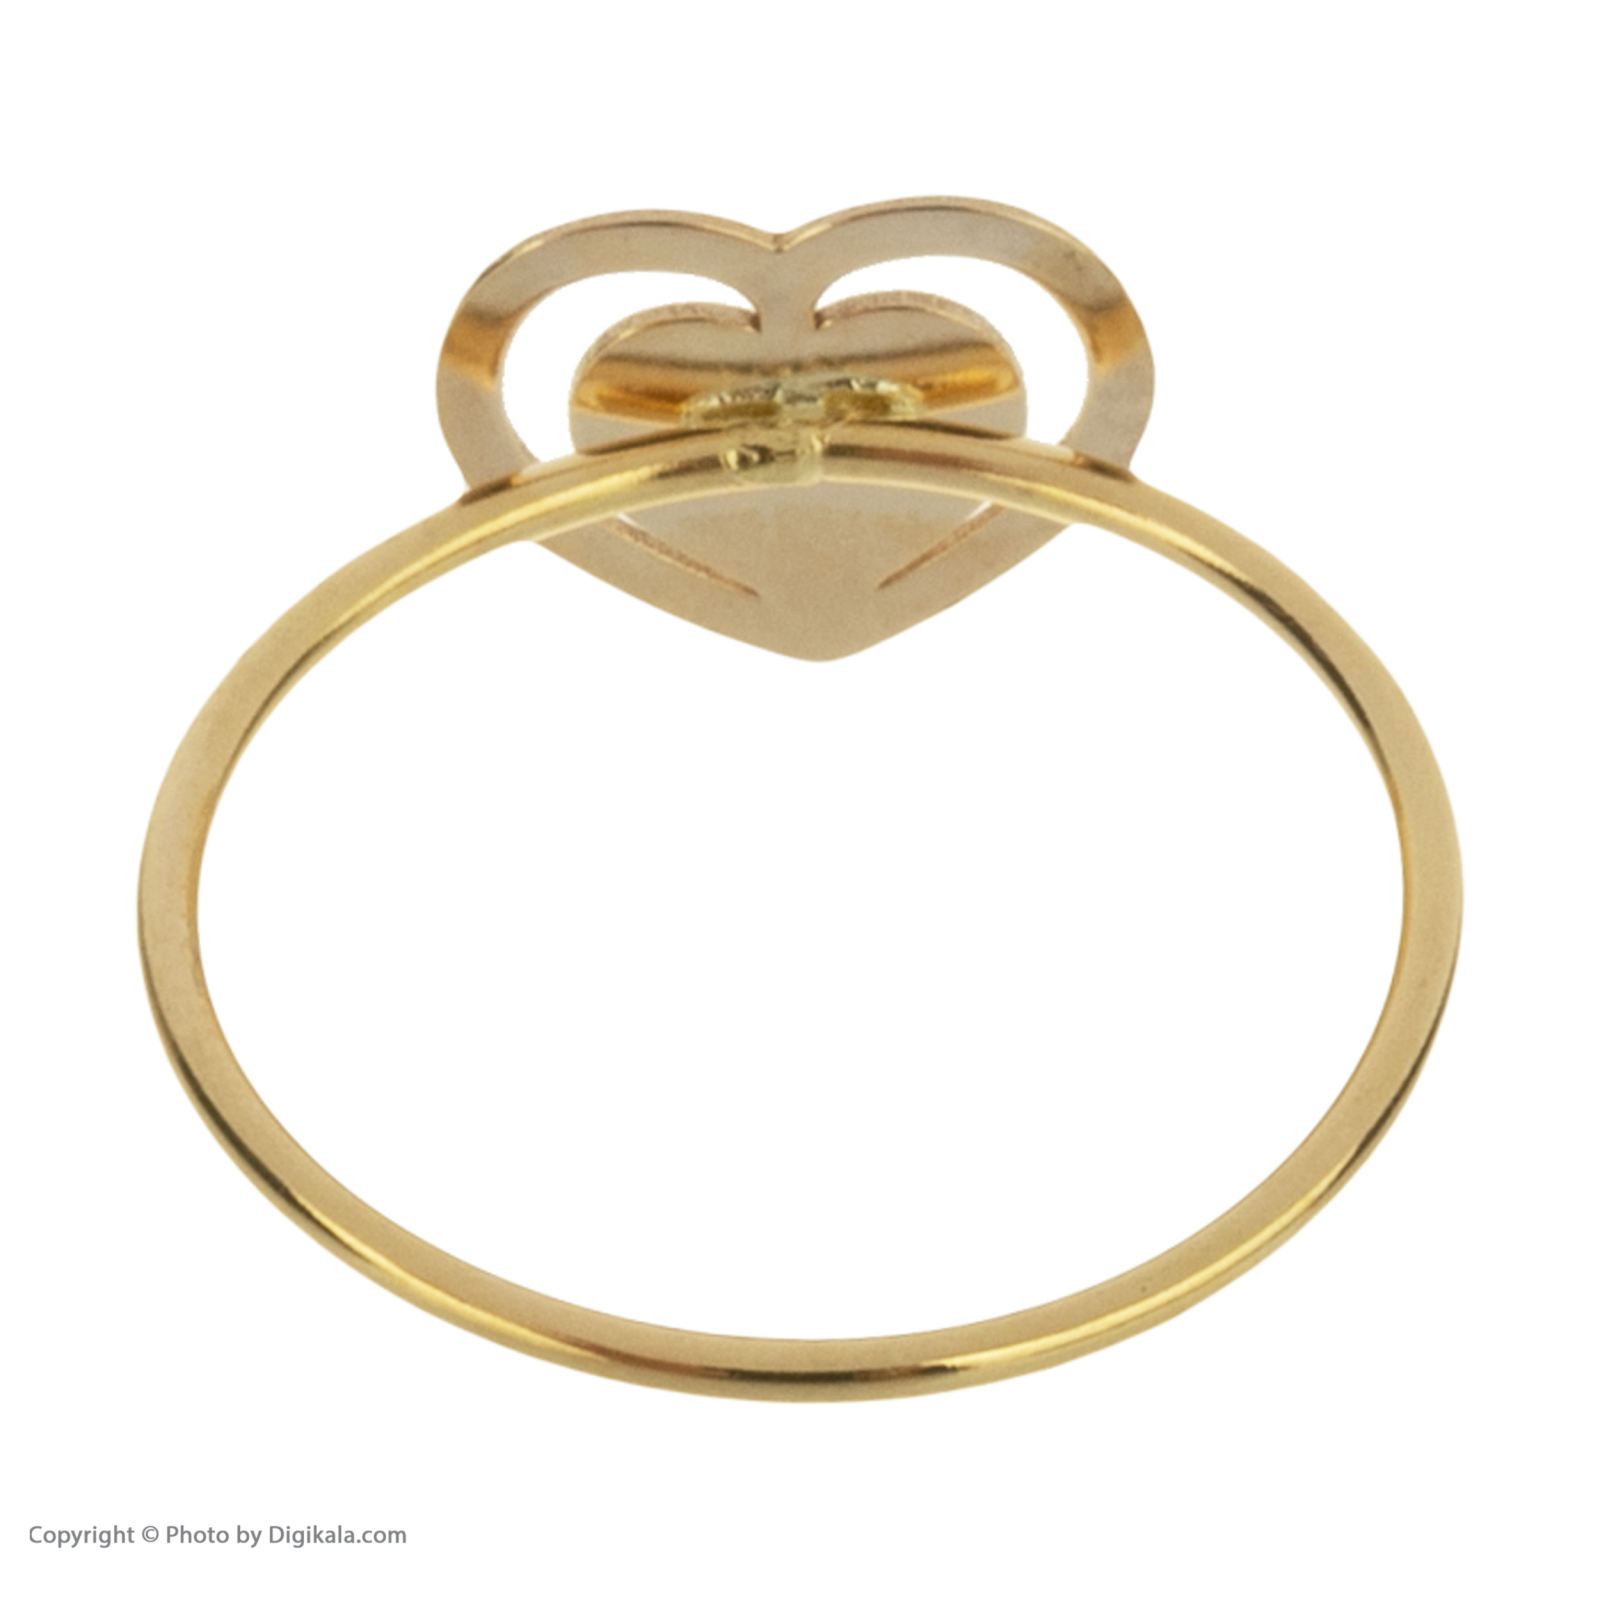 انگشتر طلا 18 عیار زنانه میو گلد مدل GD604 -  - 5